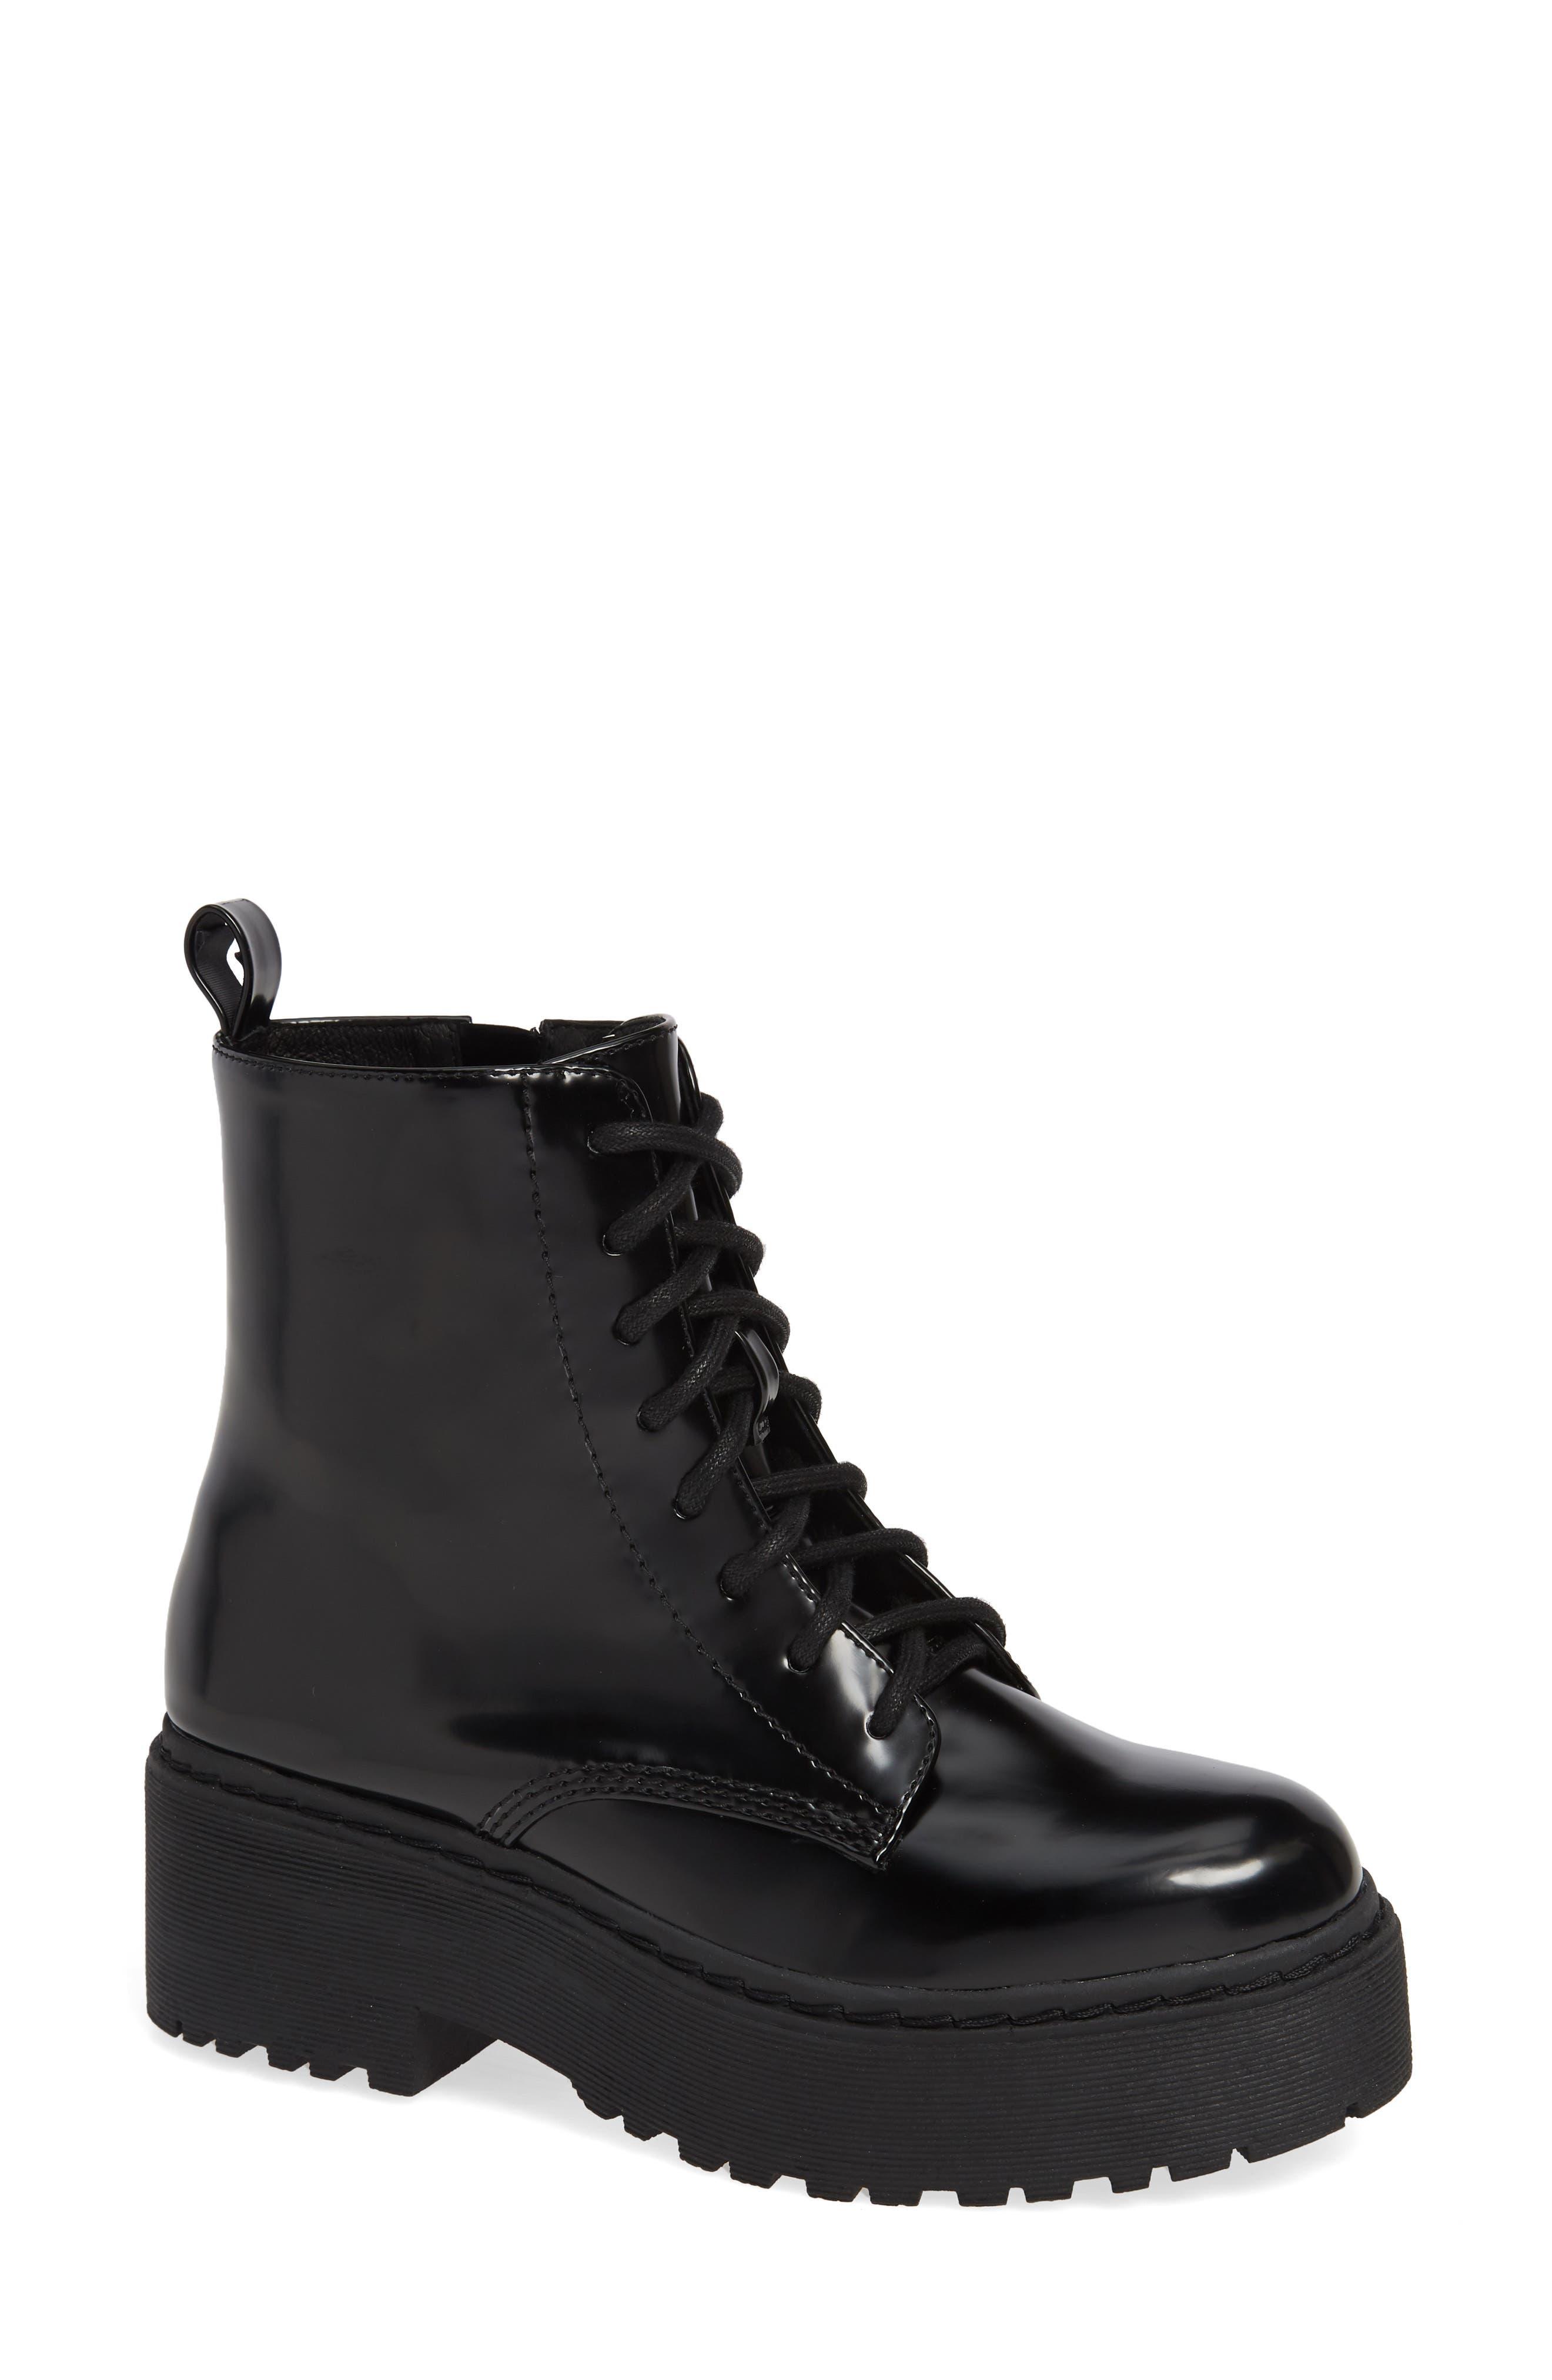 Jeffrey Campbell District Combat Boot- Black